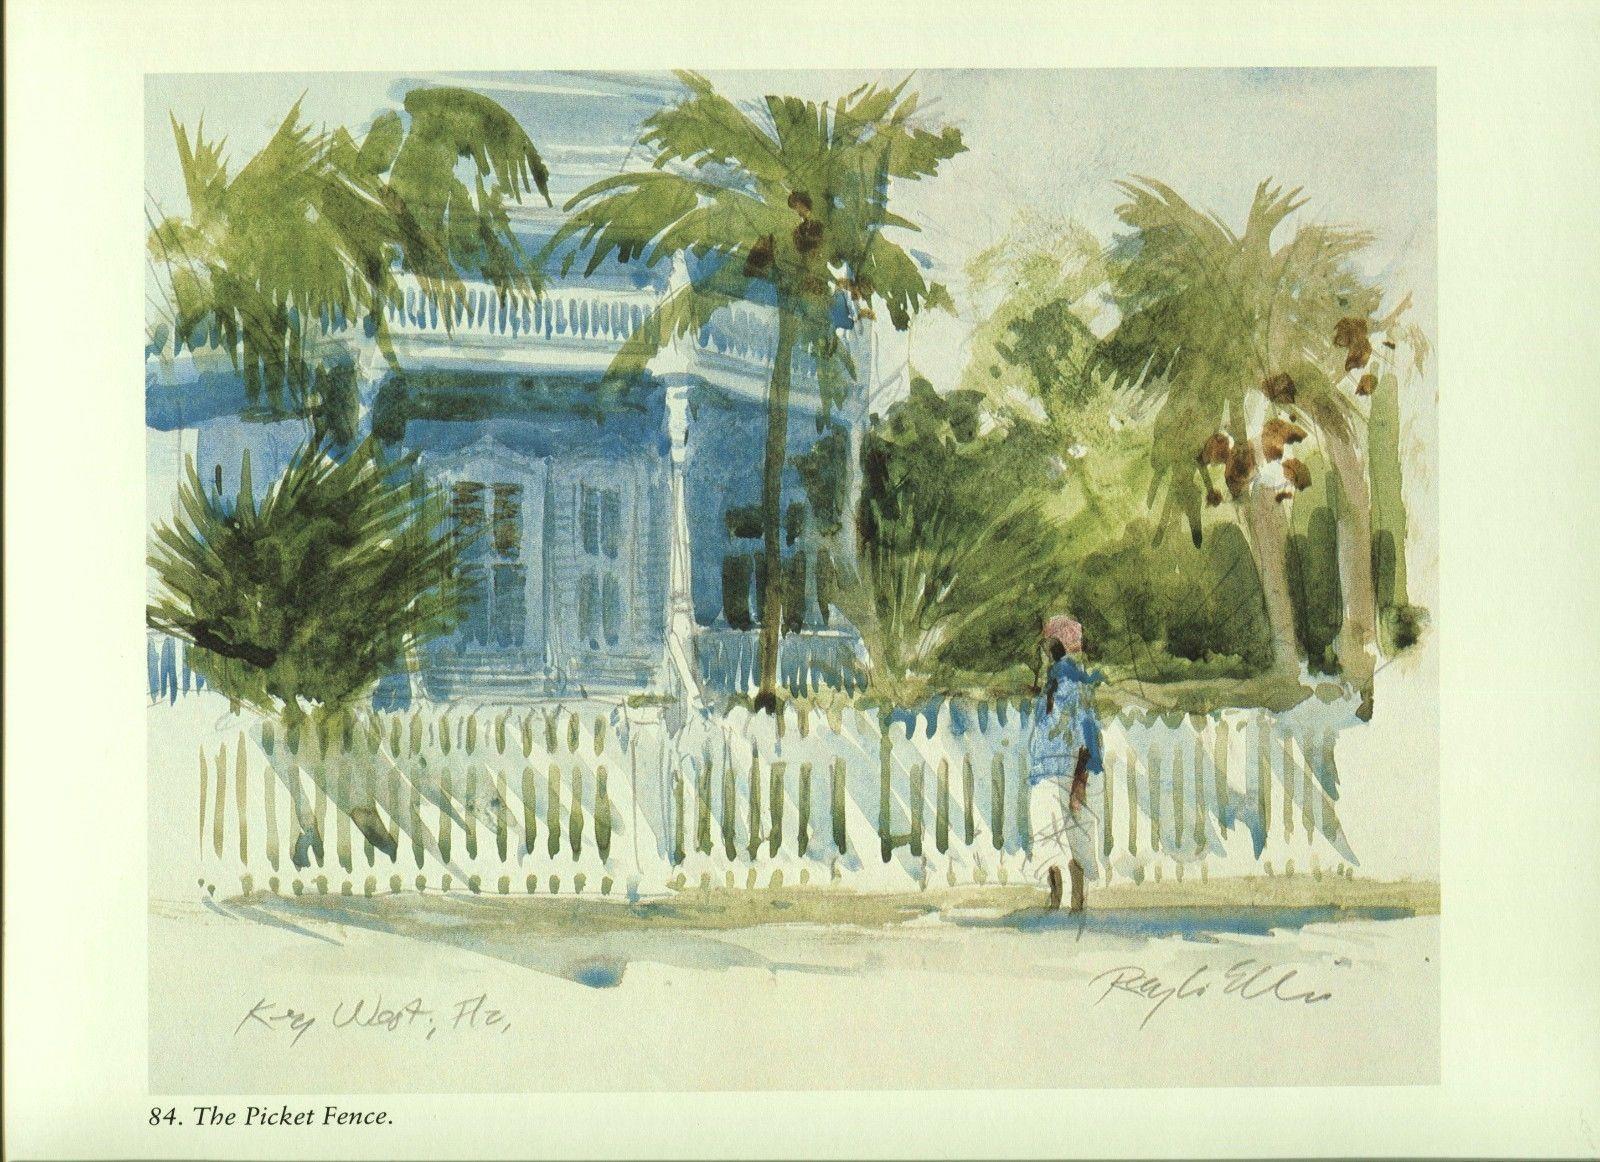 Ray Ellis. The Picket Fence. Key West, Florida. Southeast Coast 1983 print